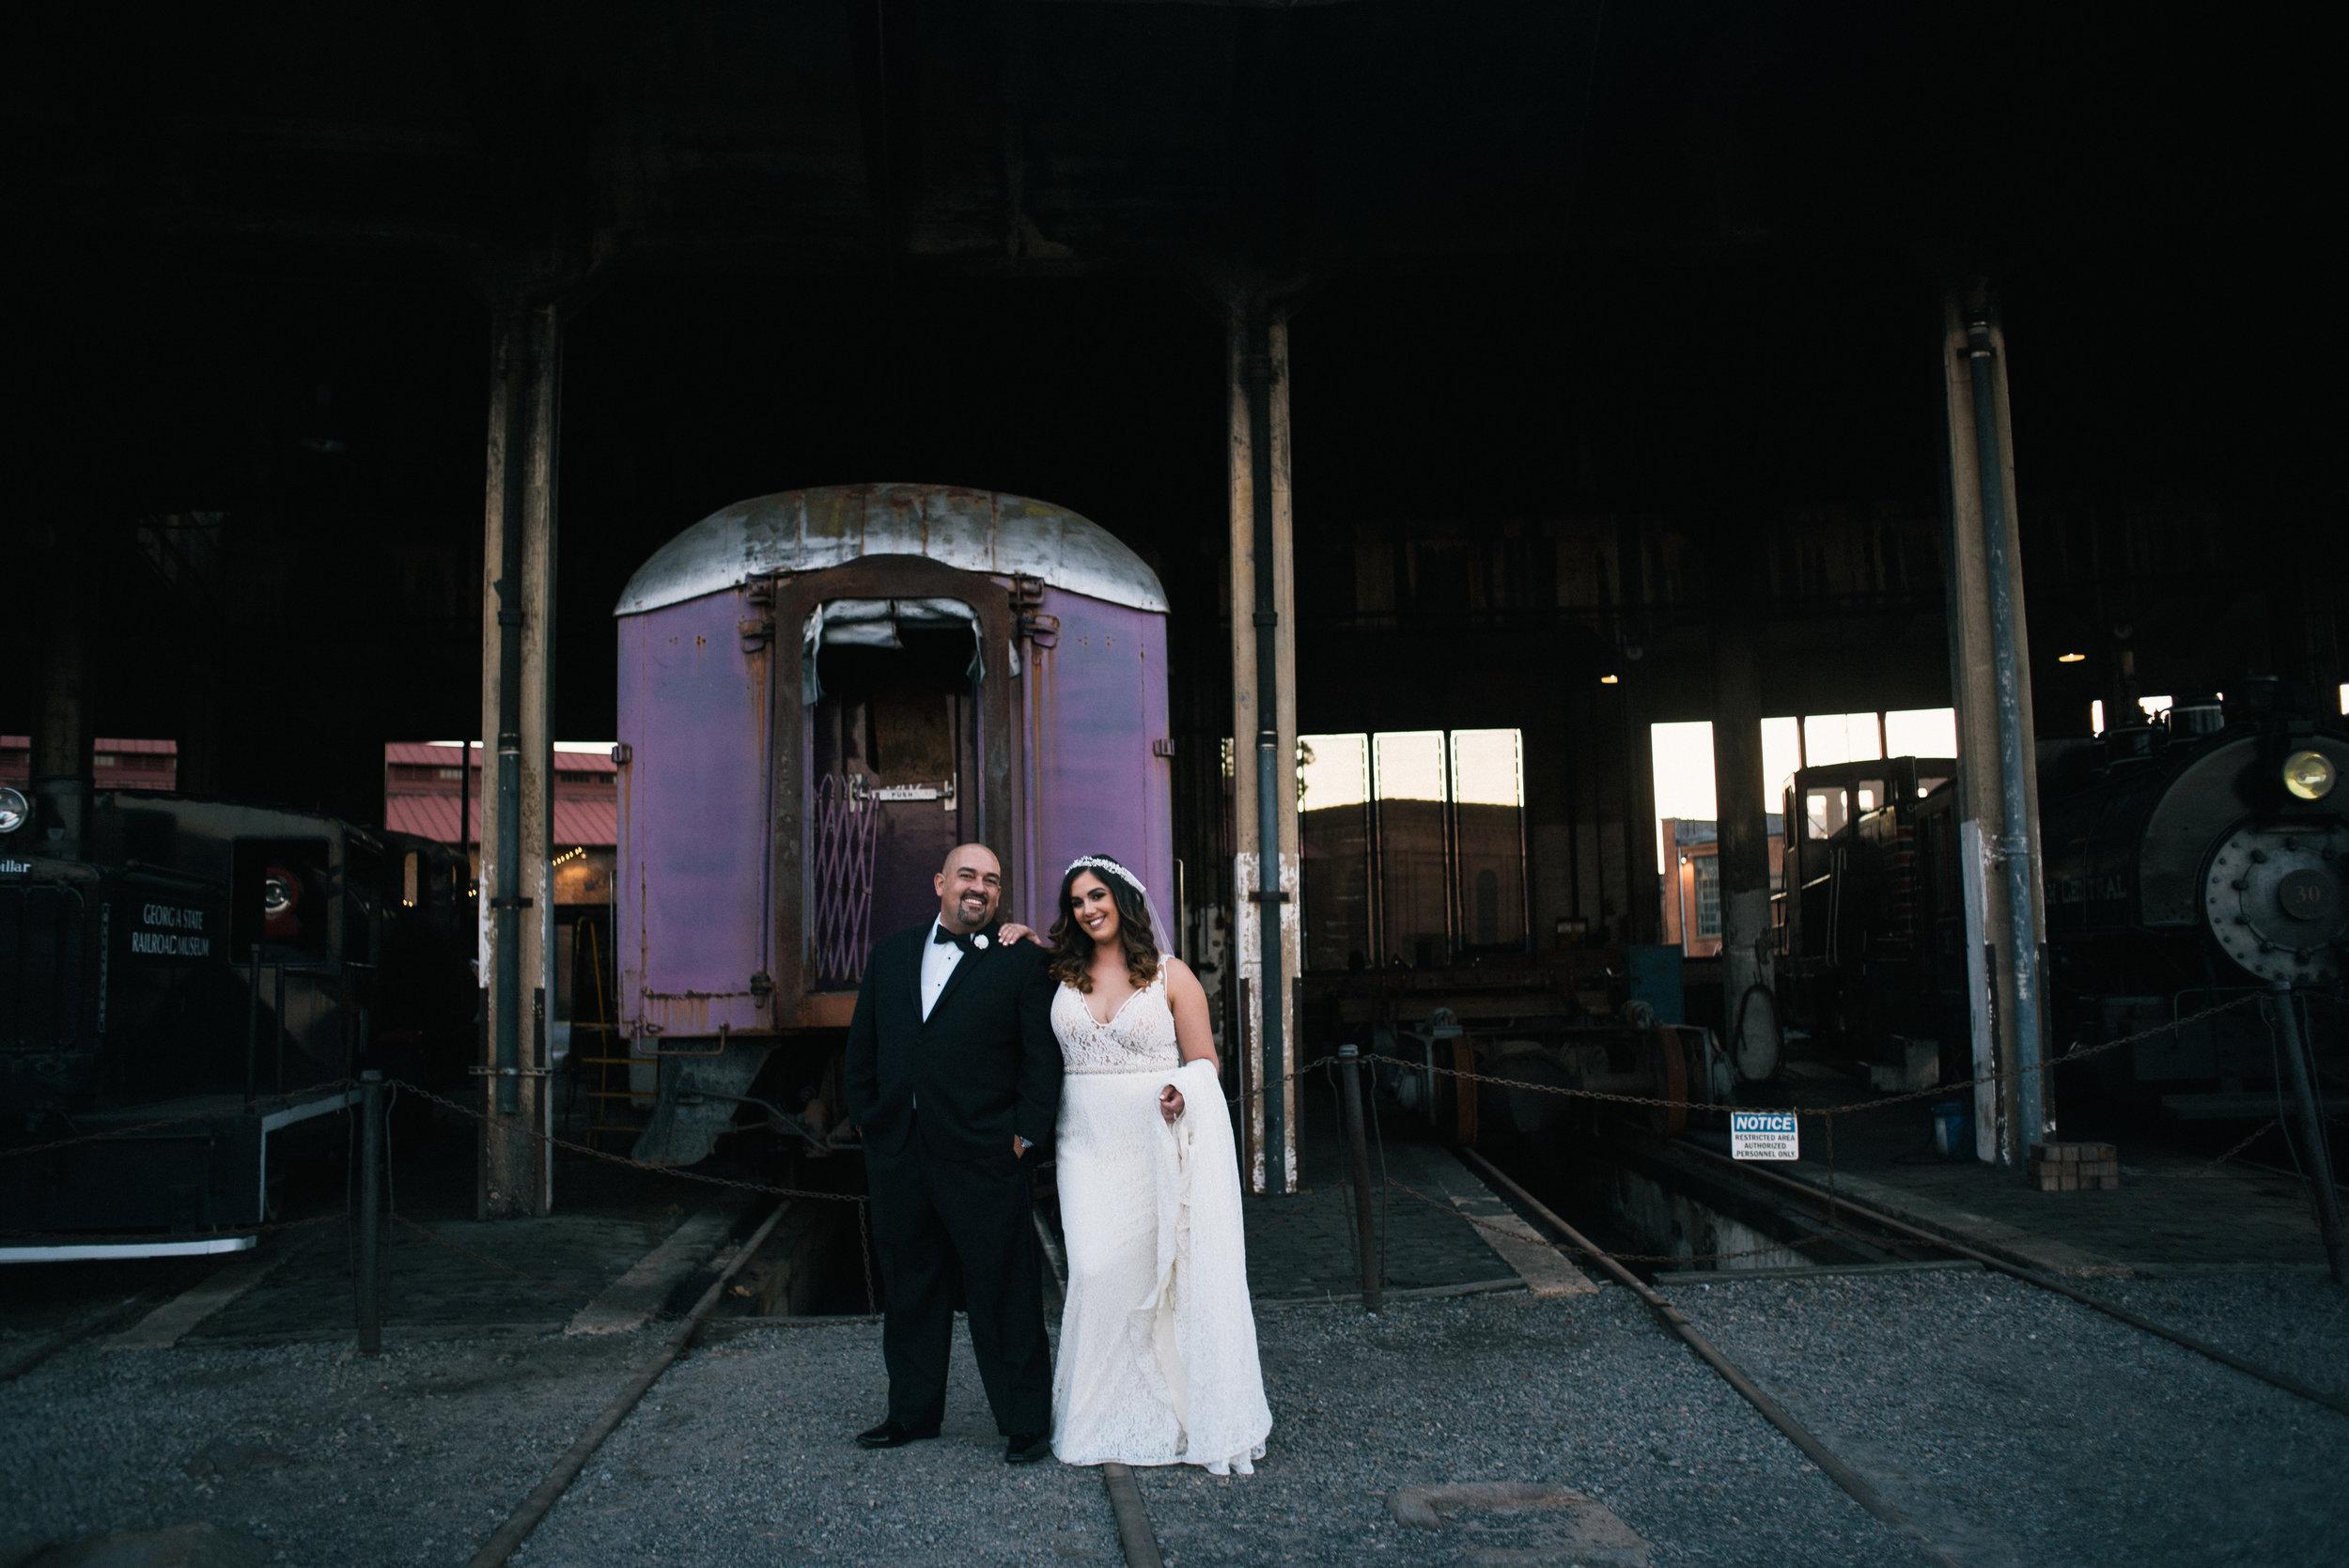 Iggy-and-yesenia-savannah-railroad-museum-wedding-meg-hill-photo- (750 of 1037).jpg